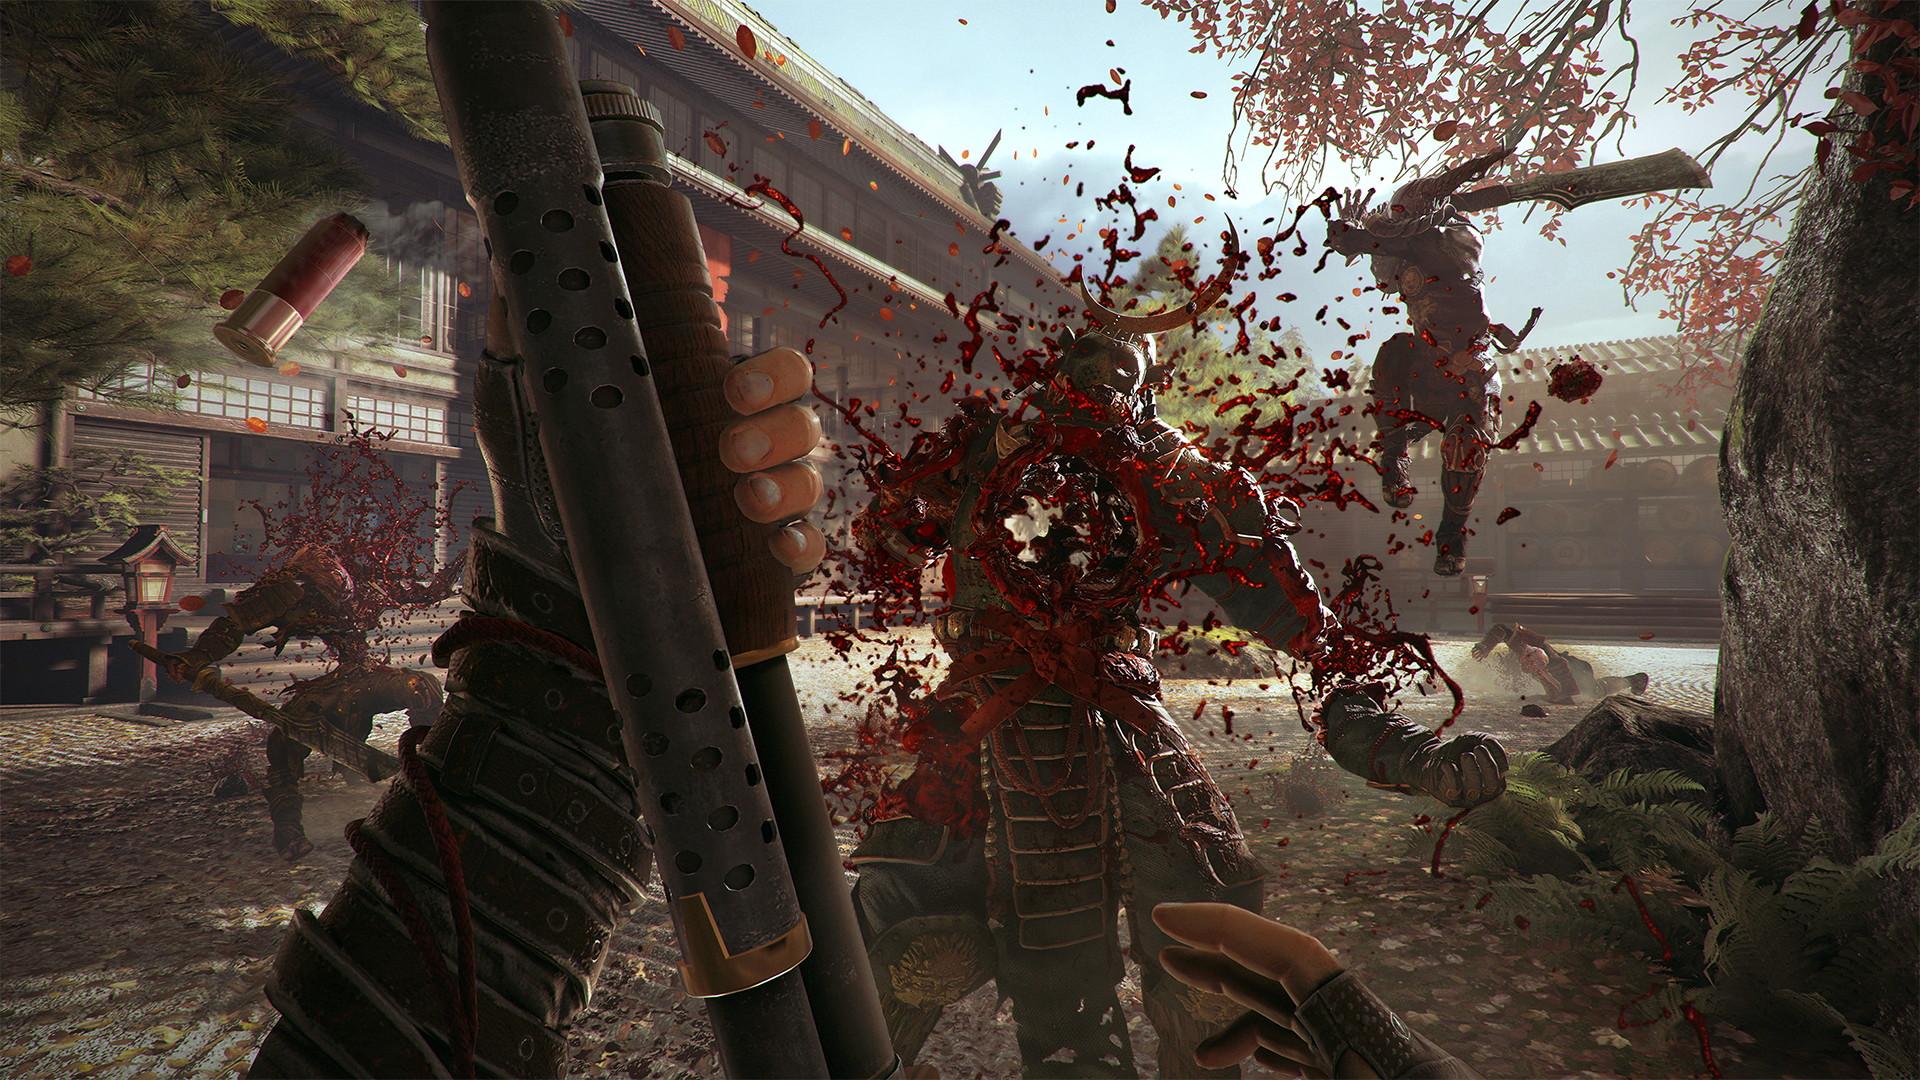 Shadow_Warrior_2 _Debut_Screenshot_02.jpg